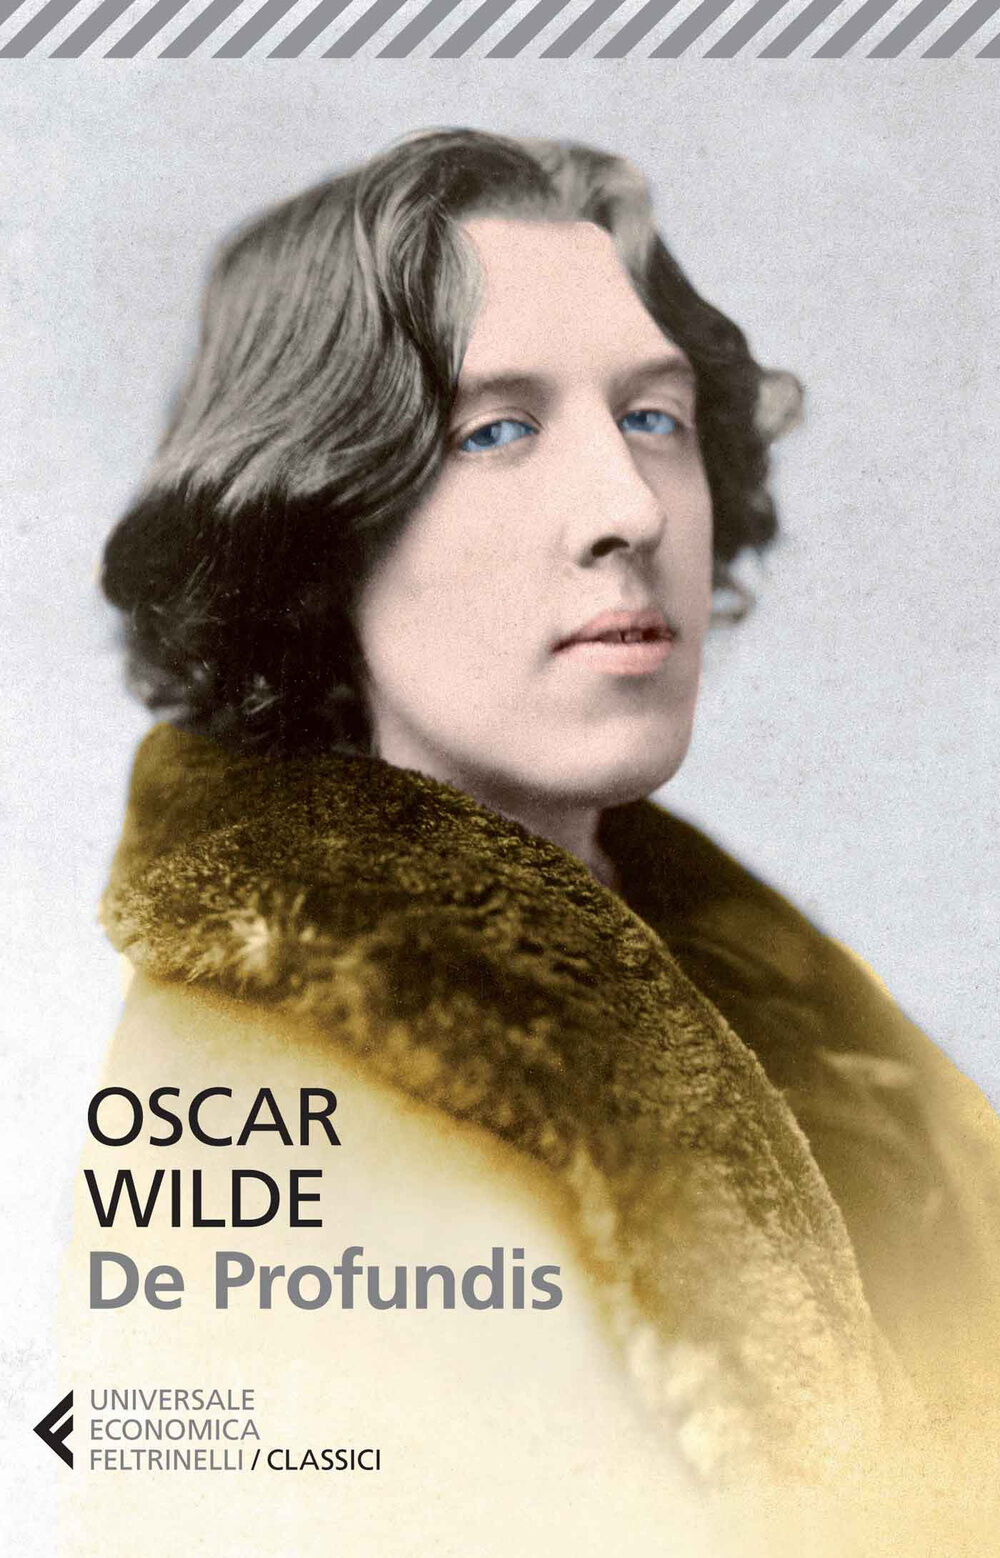 Oscar Wilde's De Profundis – one of the greatest love letters ever written